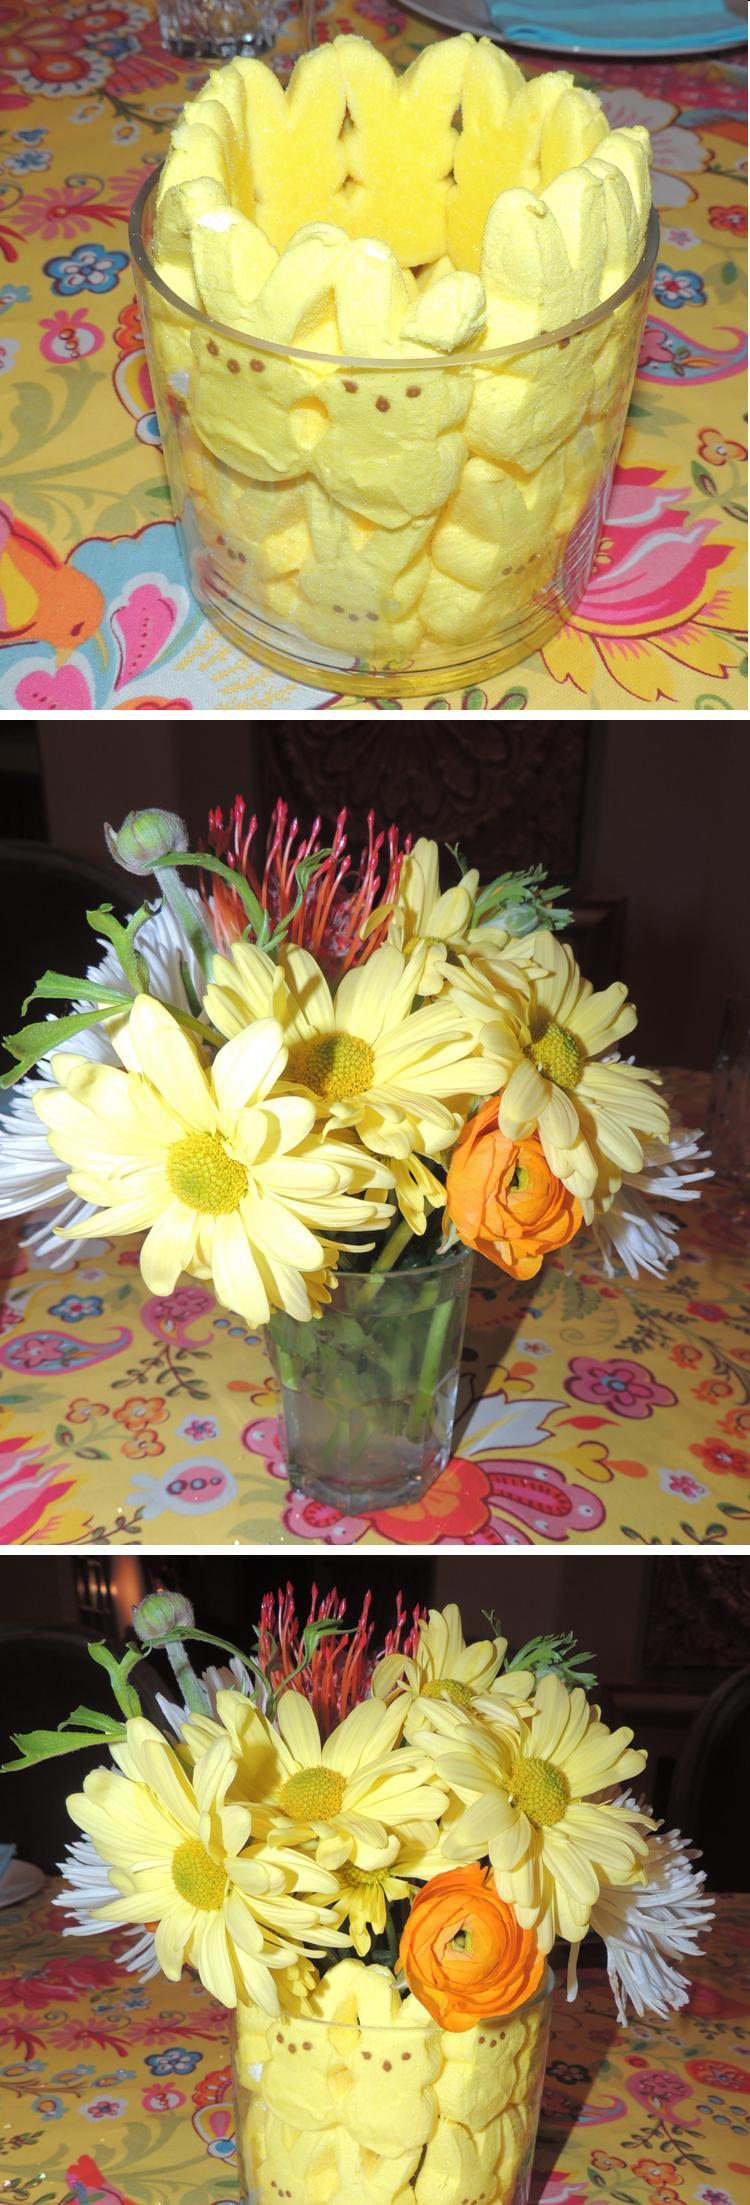 'EGG' stra Special Easter FlowerArangement